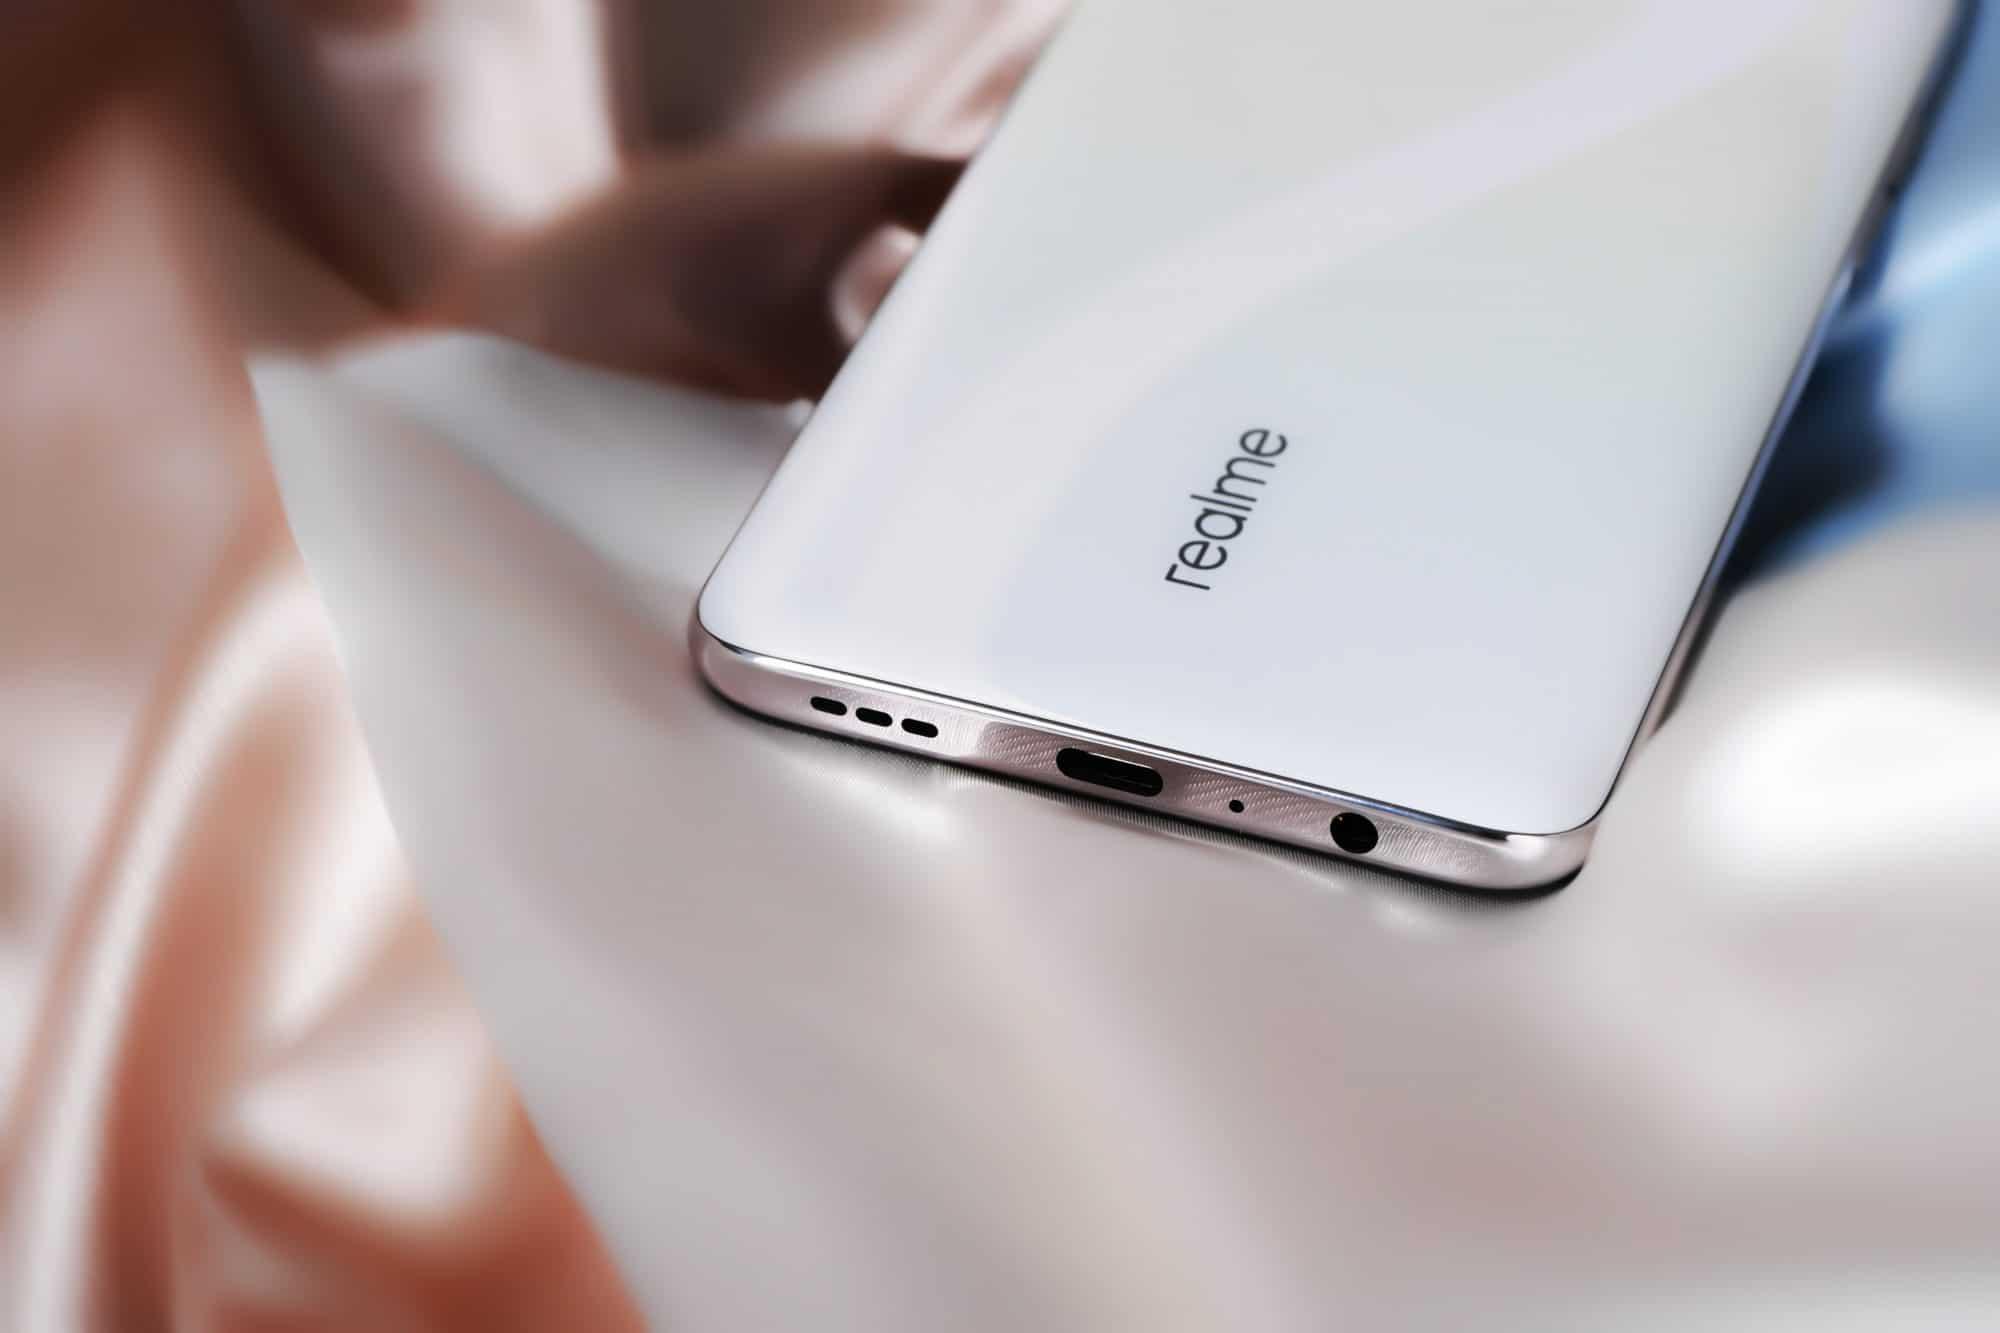 Realme เปิดตัวเรือธง Realme X กล้องป๊อปอัพ SNAP710 ราคาเริ่มต้นประมาณ 7,000.- พร้อมรุ่นพิเศษ รุ่นหัวหอม - 18 68198f4638 - Realme เปิดตัวเรือธง Realme X กล้องป๊อปอัพ SNAP710 ราคาเริ่มต้นประมาณ 7,000.- พร้อมรุ่นพิเศษ รุ่นหัวหอม